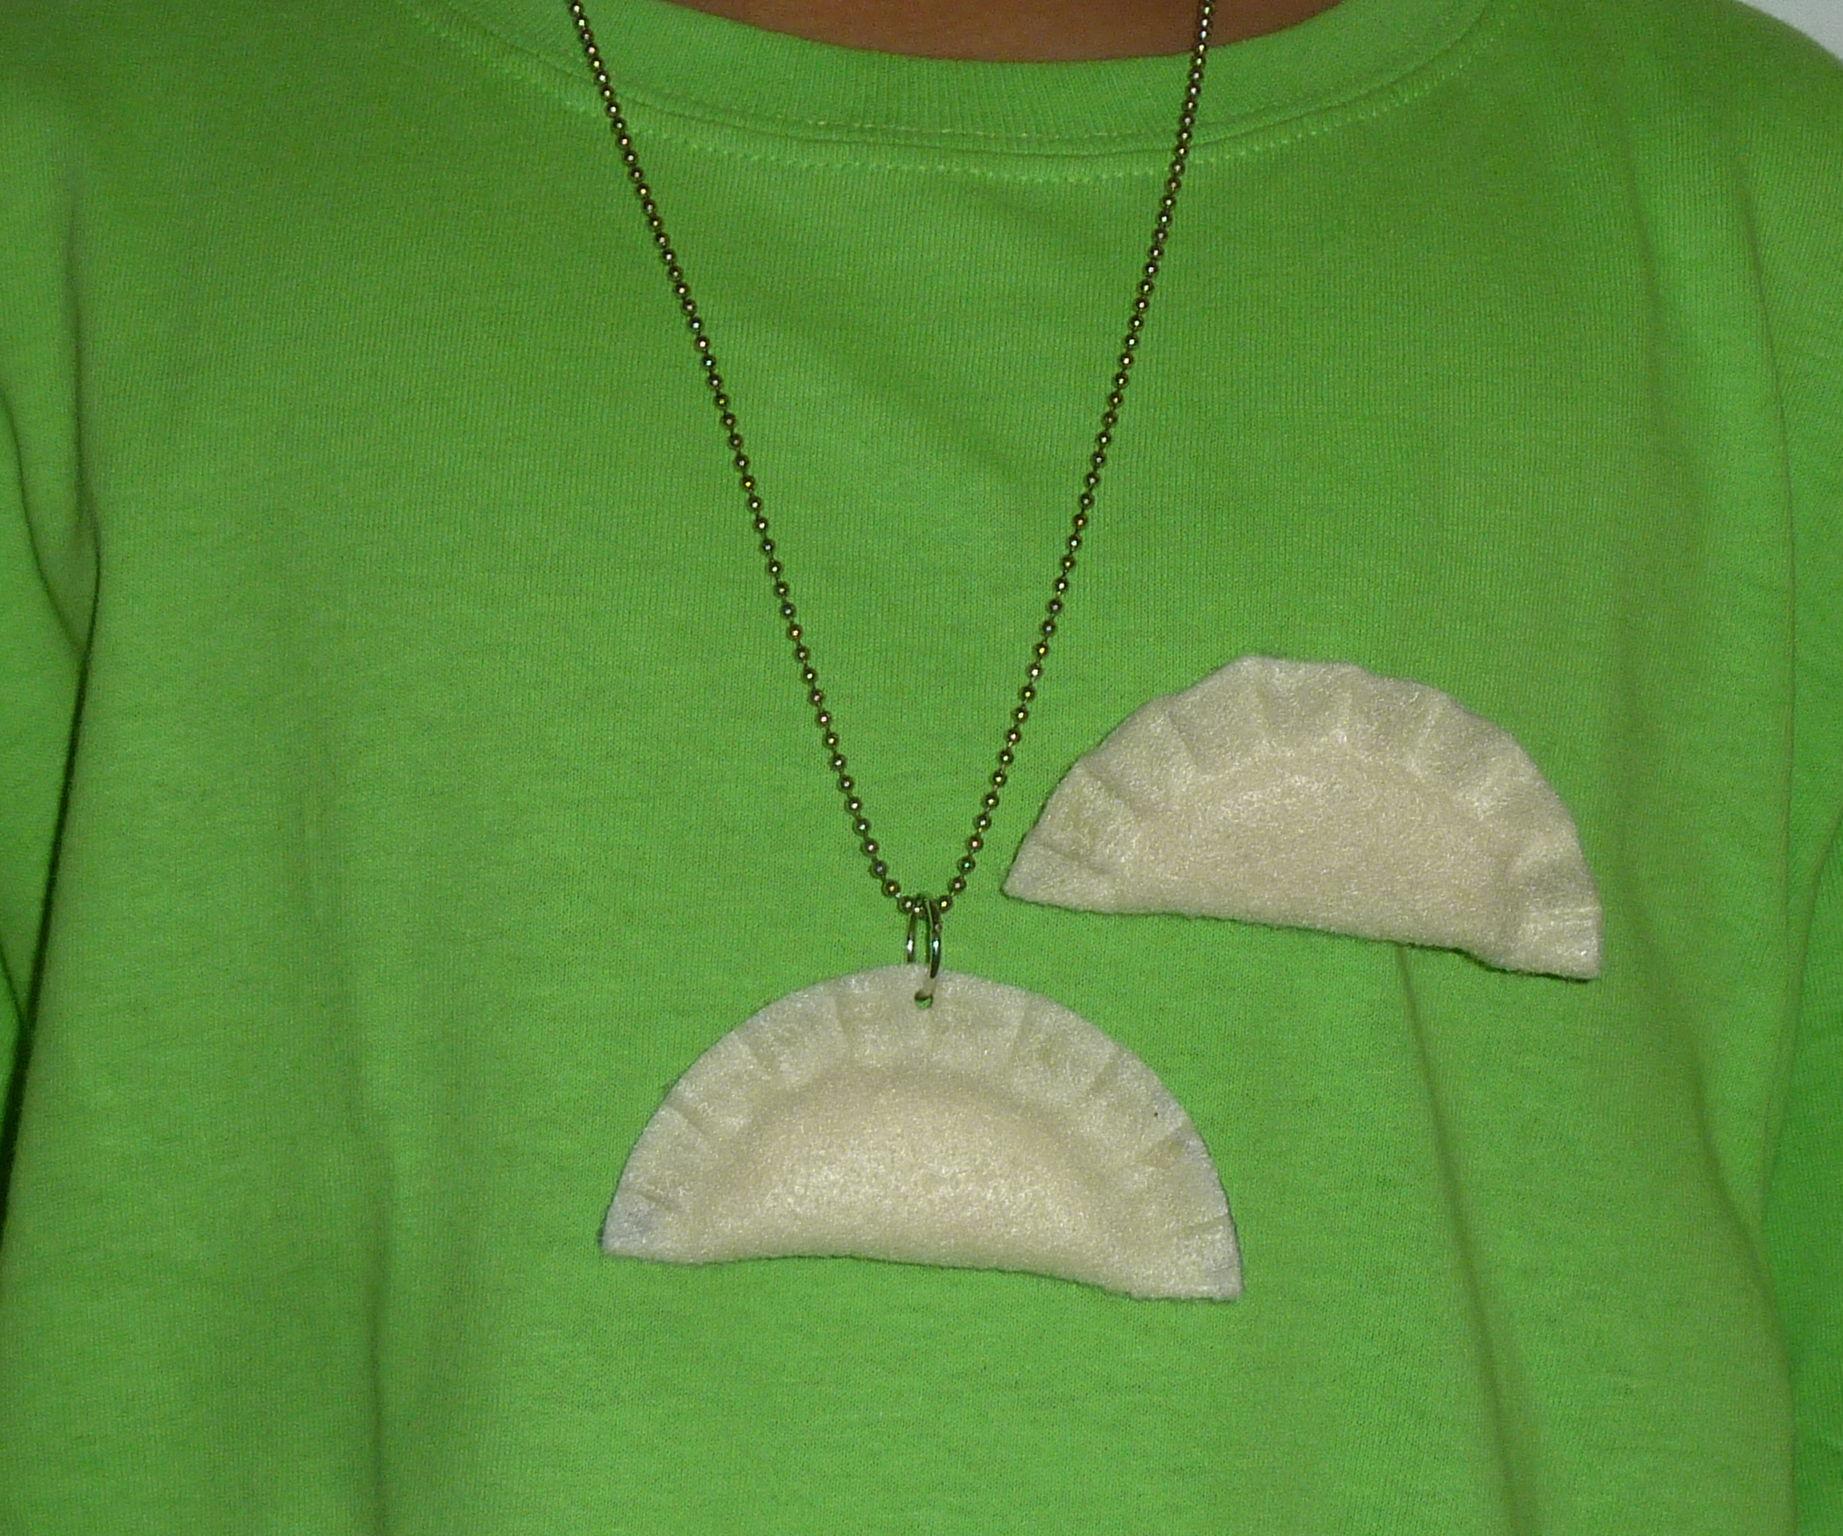 Dumpling (Jiaoji) Jewelry